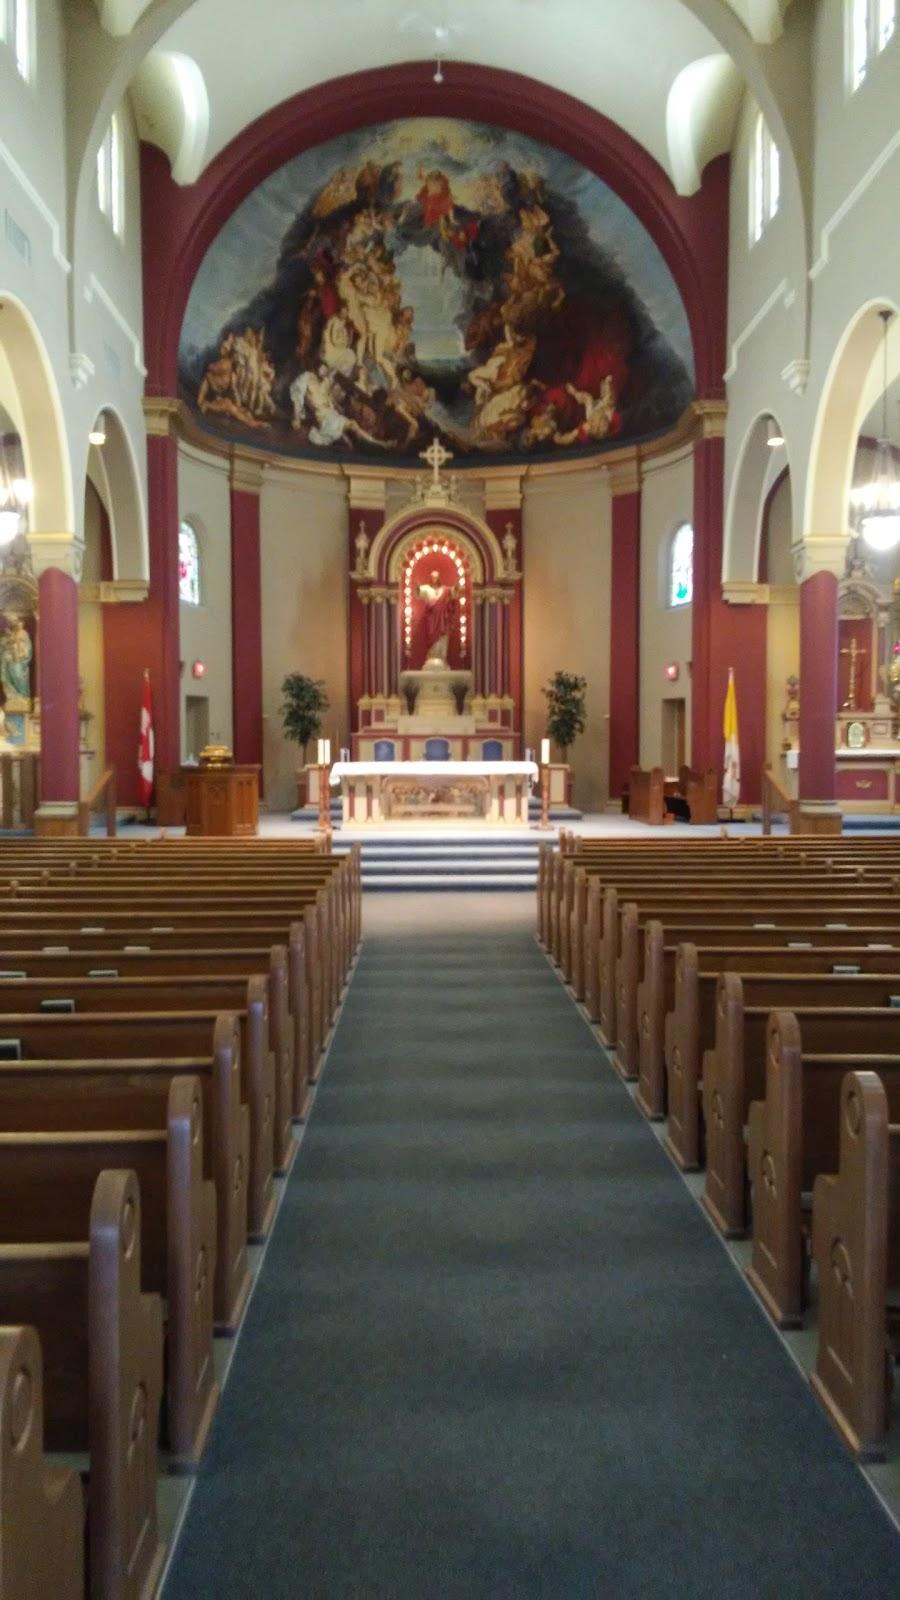 Sacred Heart Church - church    Photo 6 of 7   Address: 1425 Divine St, LaSalle, ON N9J 0C5, Canada   Phone: (519) 734-7512